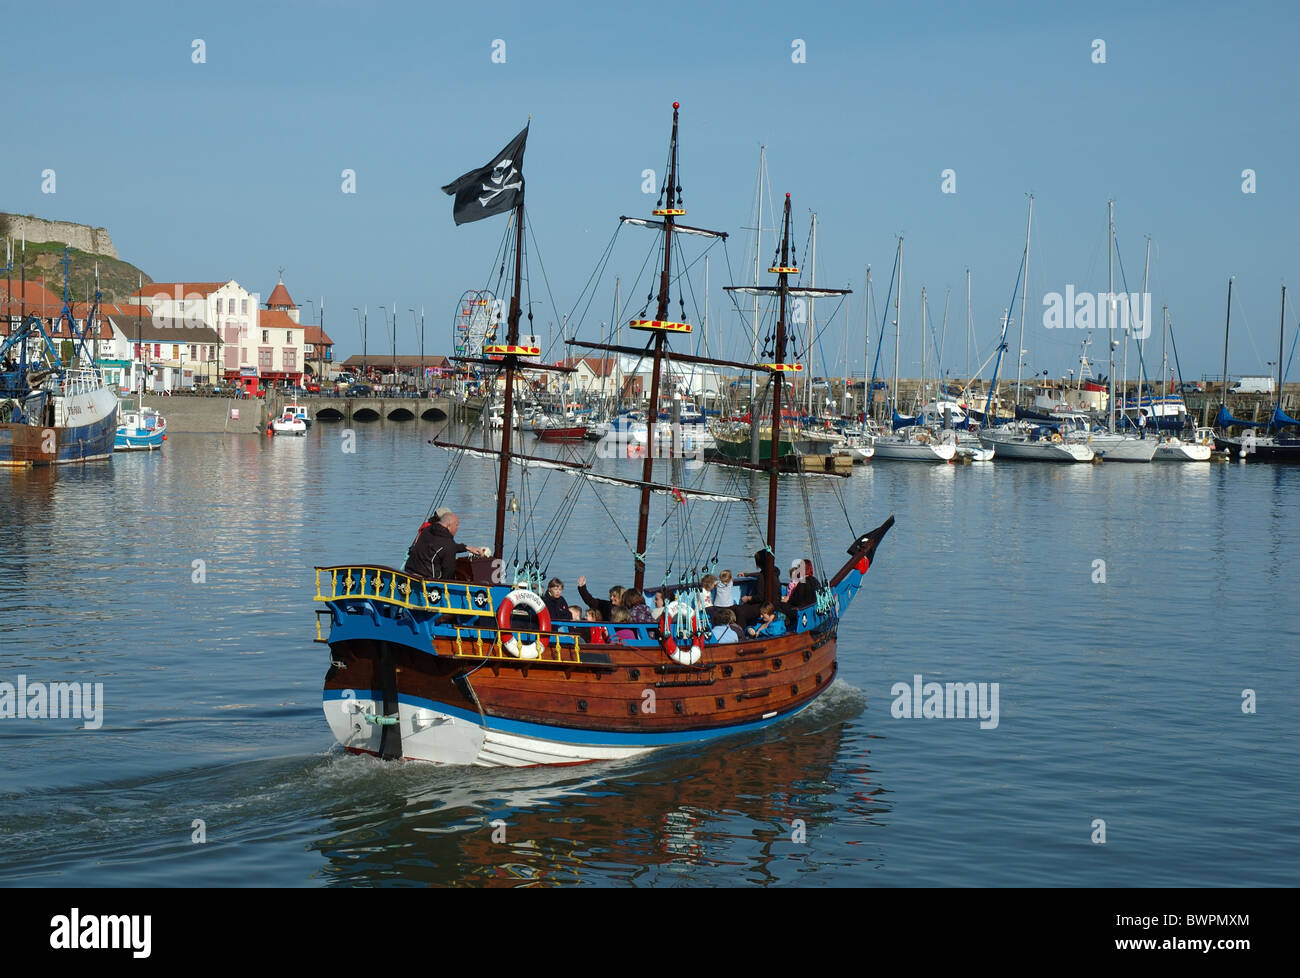 the pirate ship hispaniola scarborough north yorkshire england